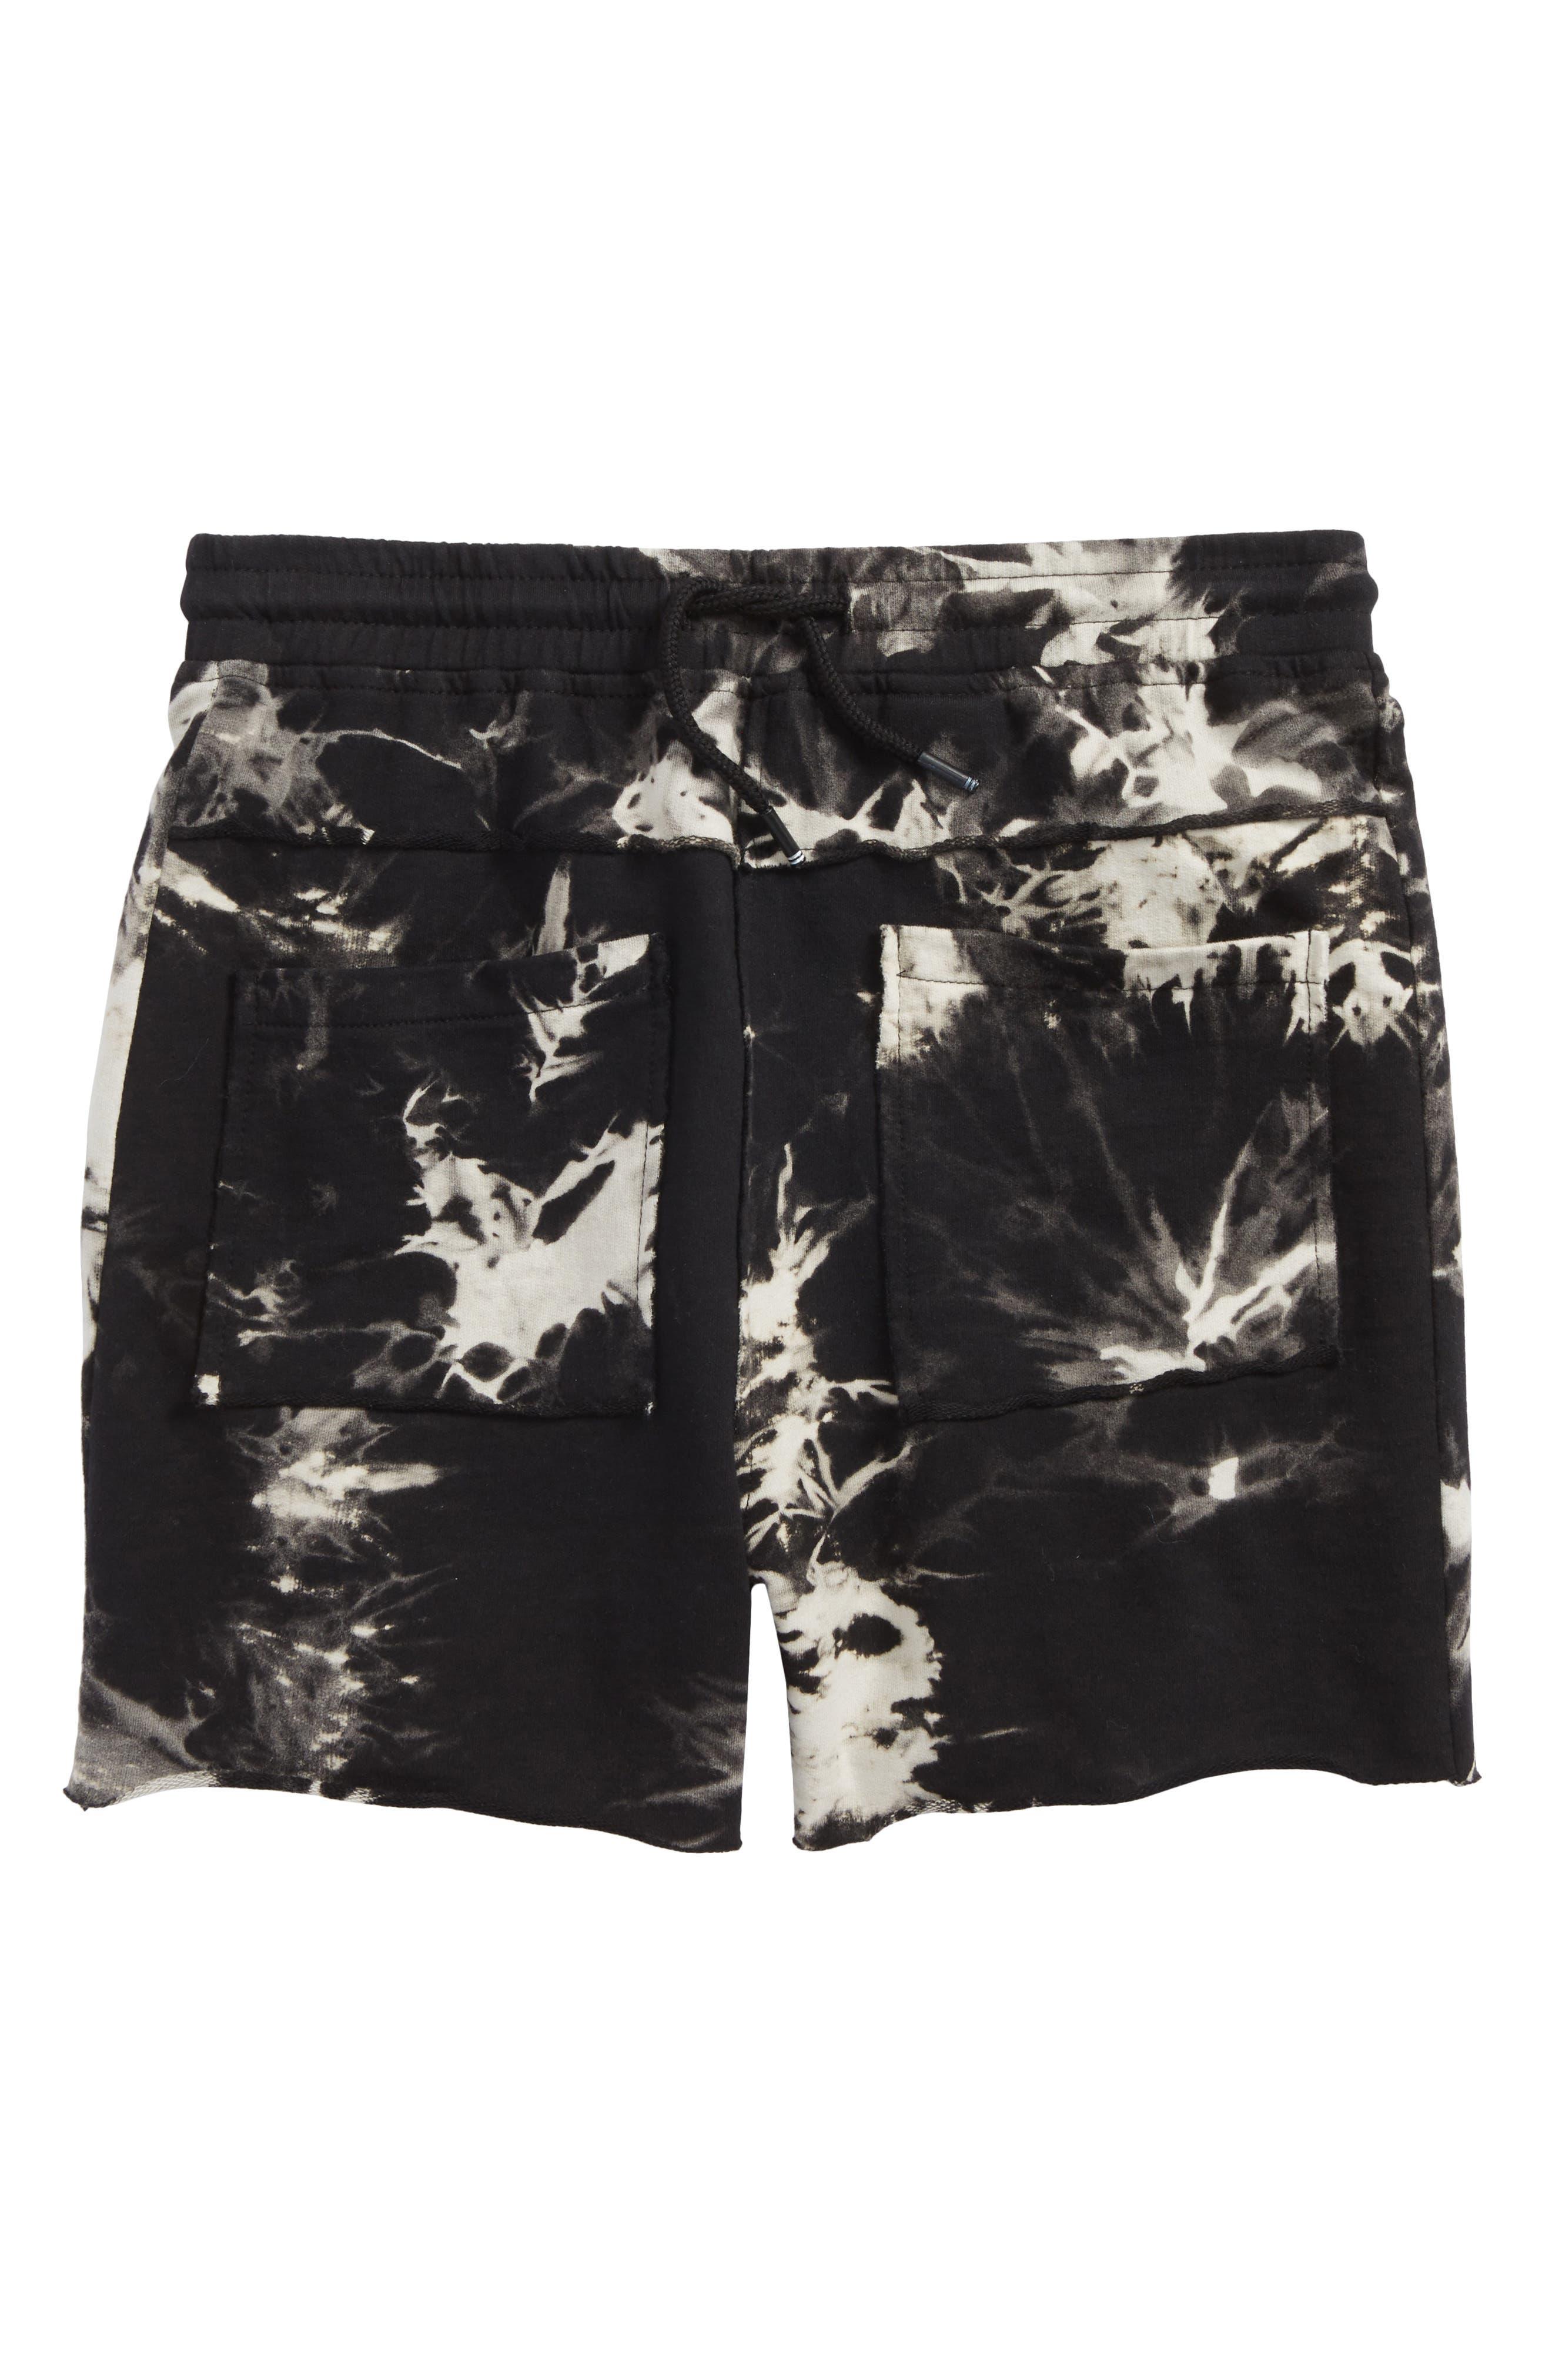 Reese Shorts,                         Main,                         color, Black